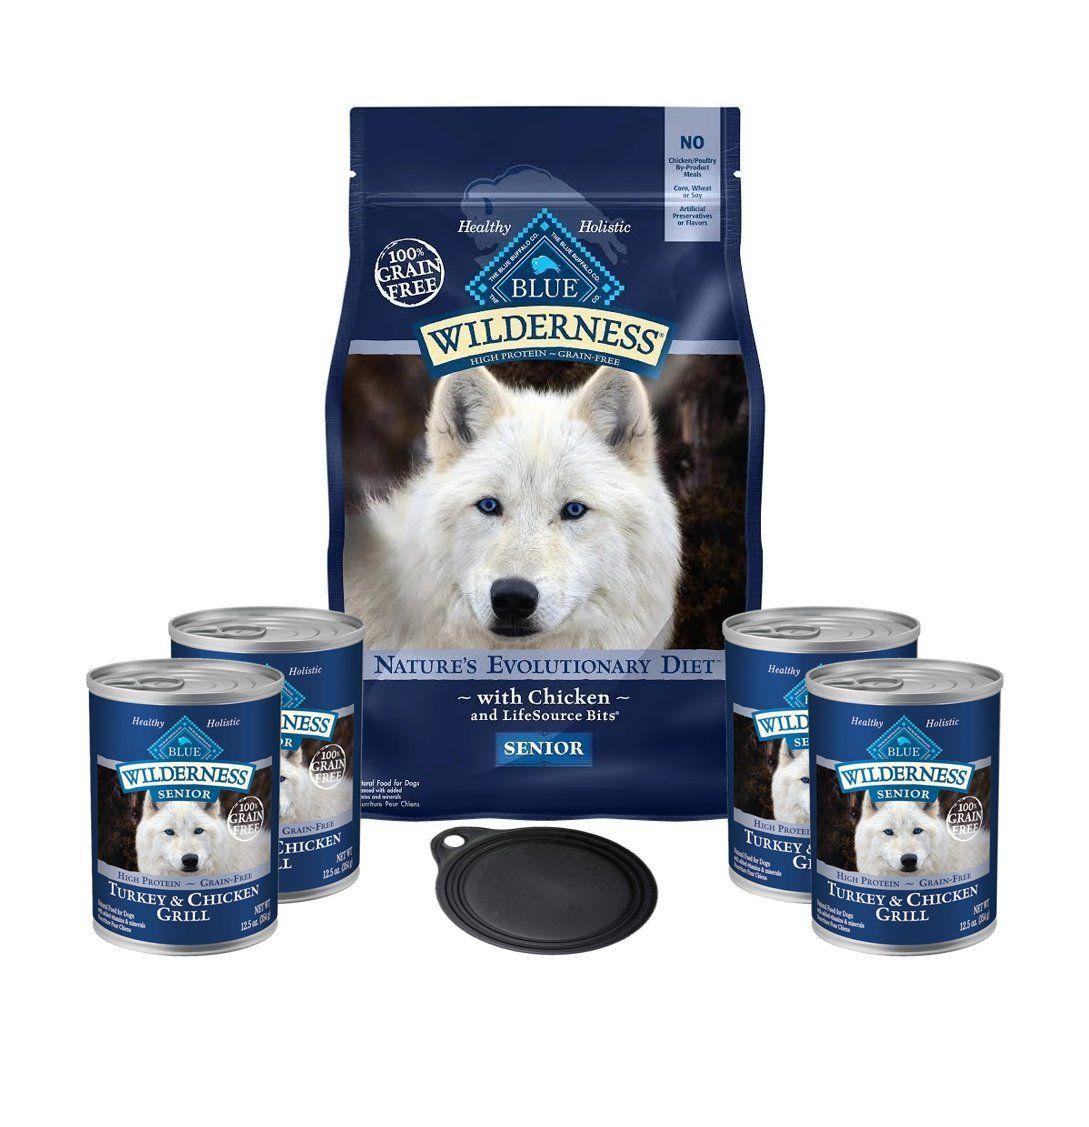 Blue Buffalo Wilderness Dog Food High Protein Grain Free Senior